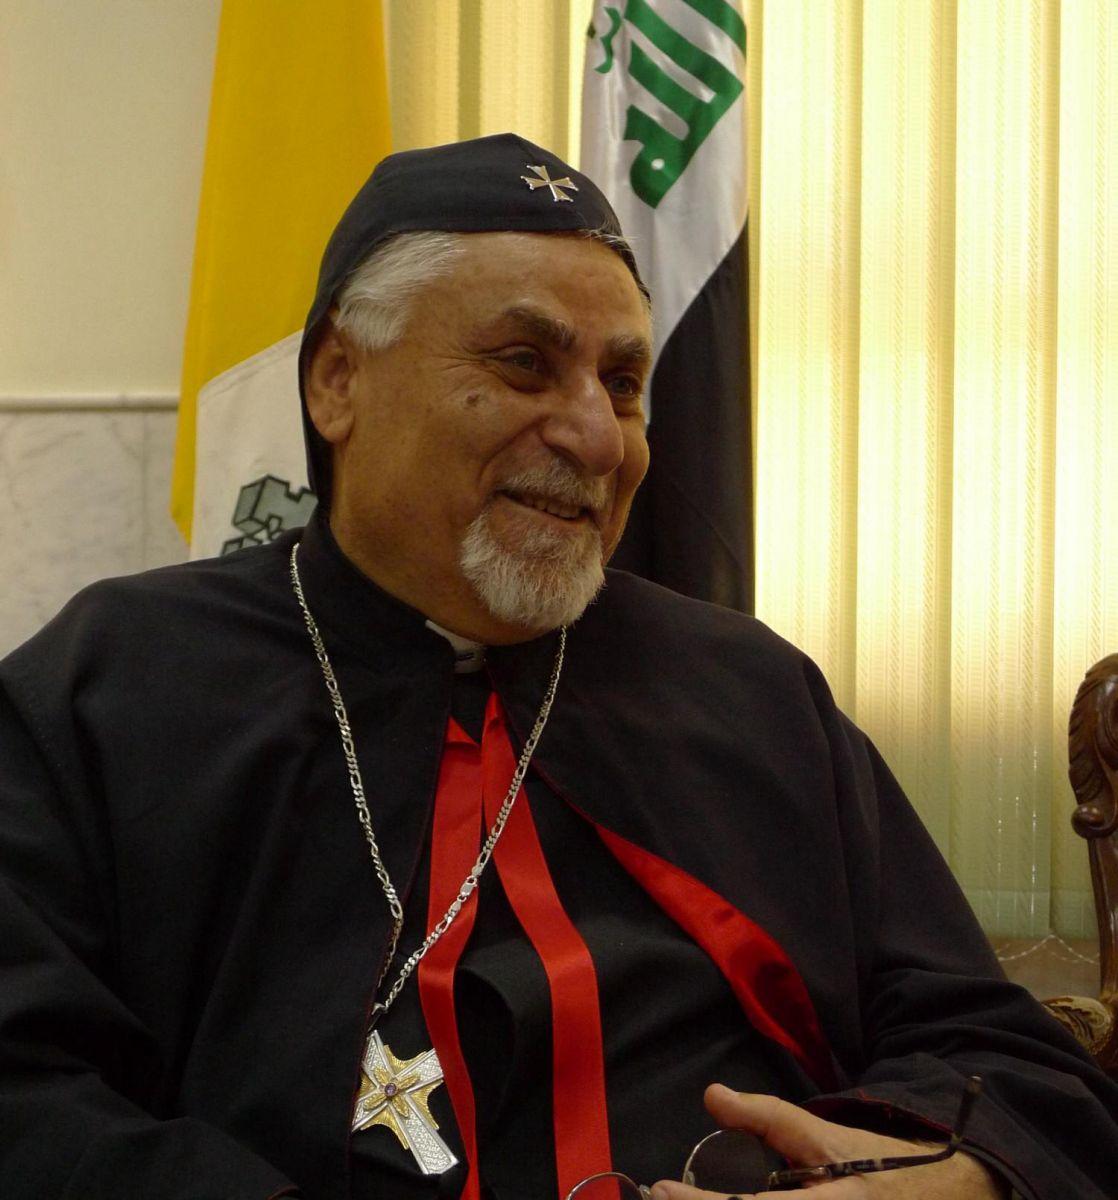 hcef.org_media_images_acn_1805_irak_Erzbischof-Boutros-Moshe-c-KIRCHE-IN-NOT2